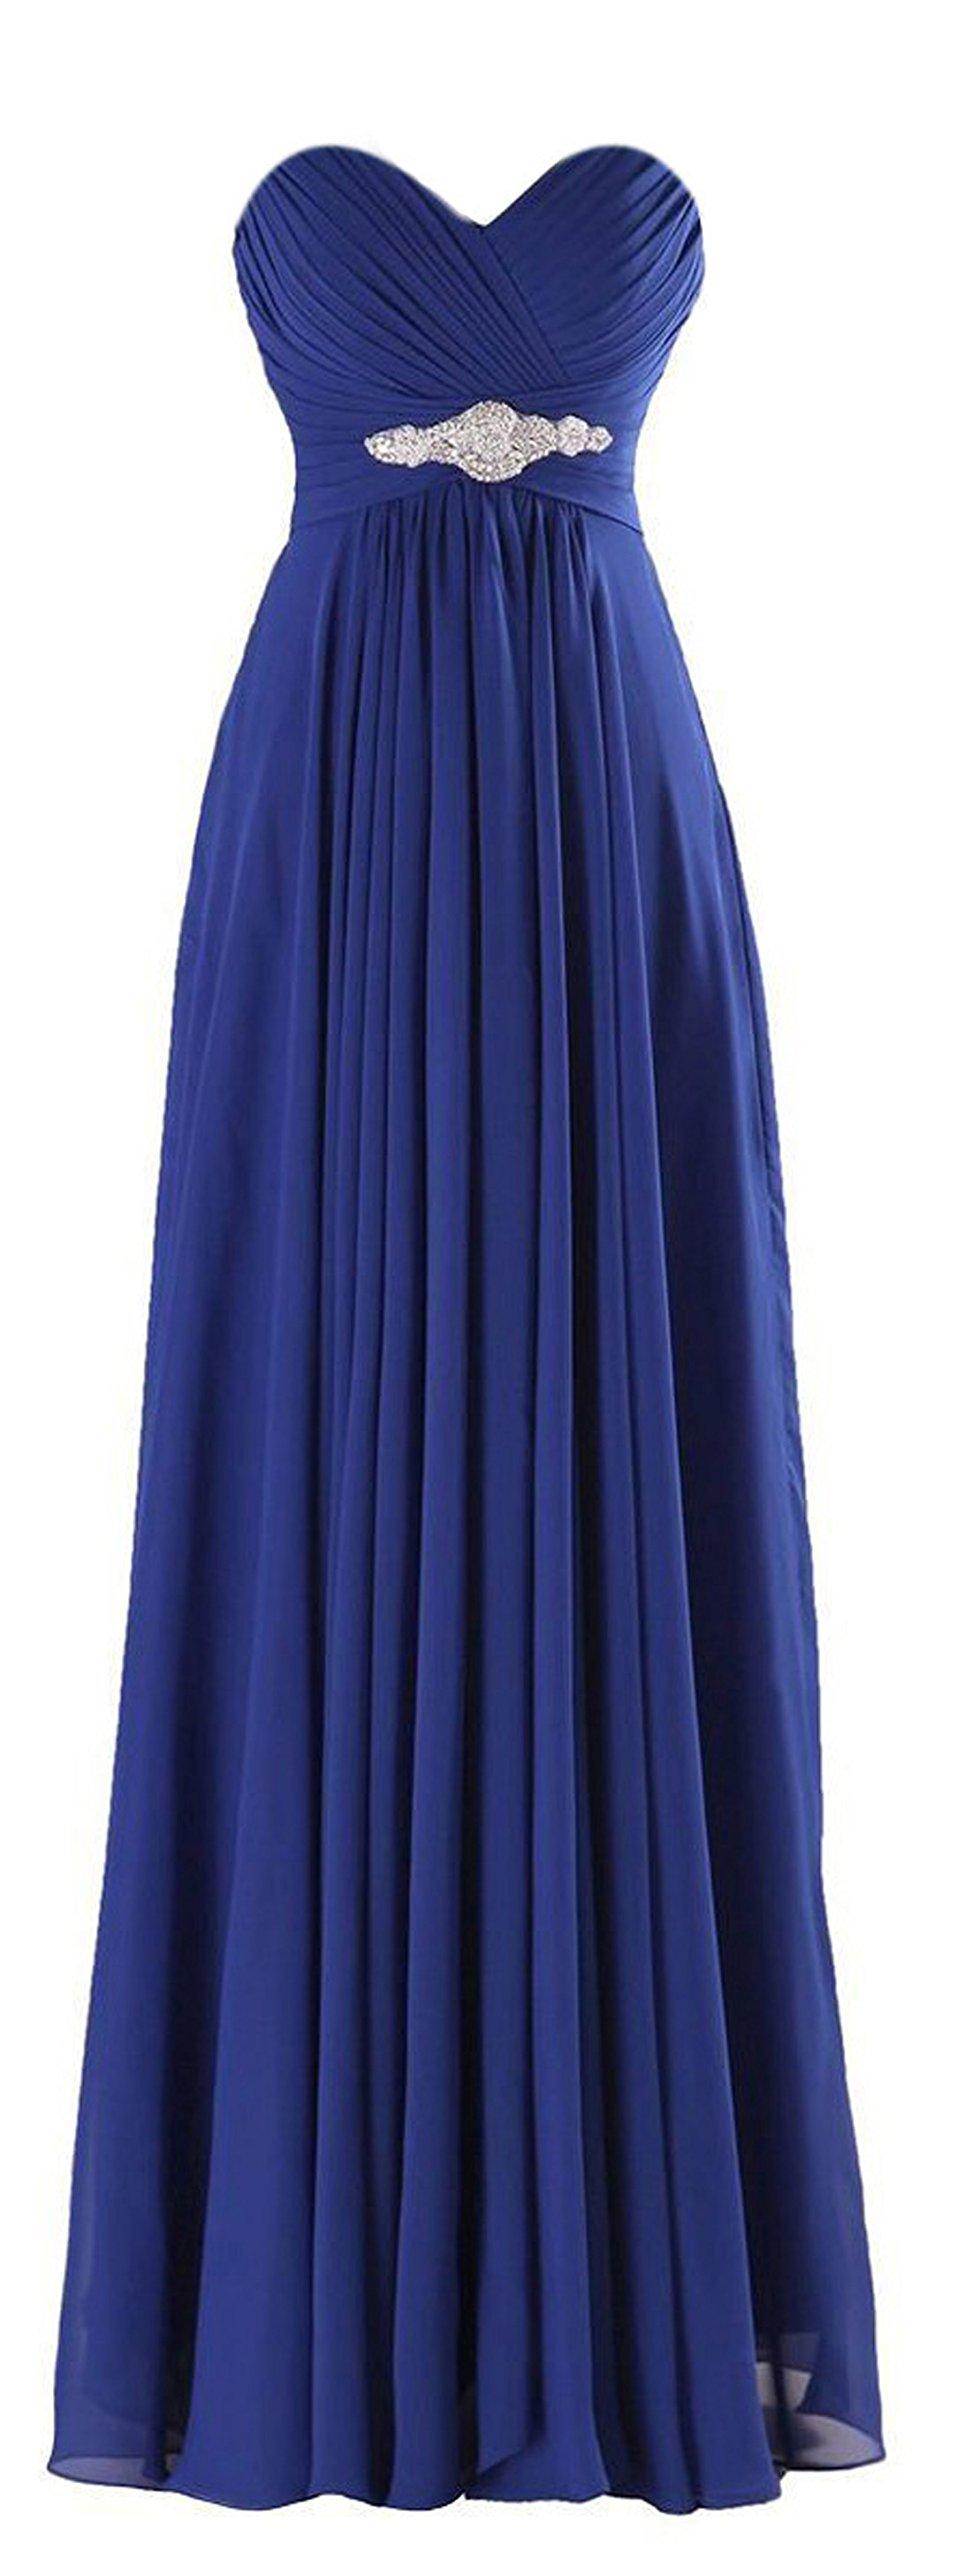 ThaliaDress Long Chiffon Sweetheart Evening Bridesmaid Dresses Prom Gowns T002LF Royal Blue US8